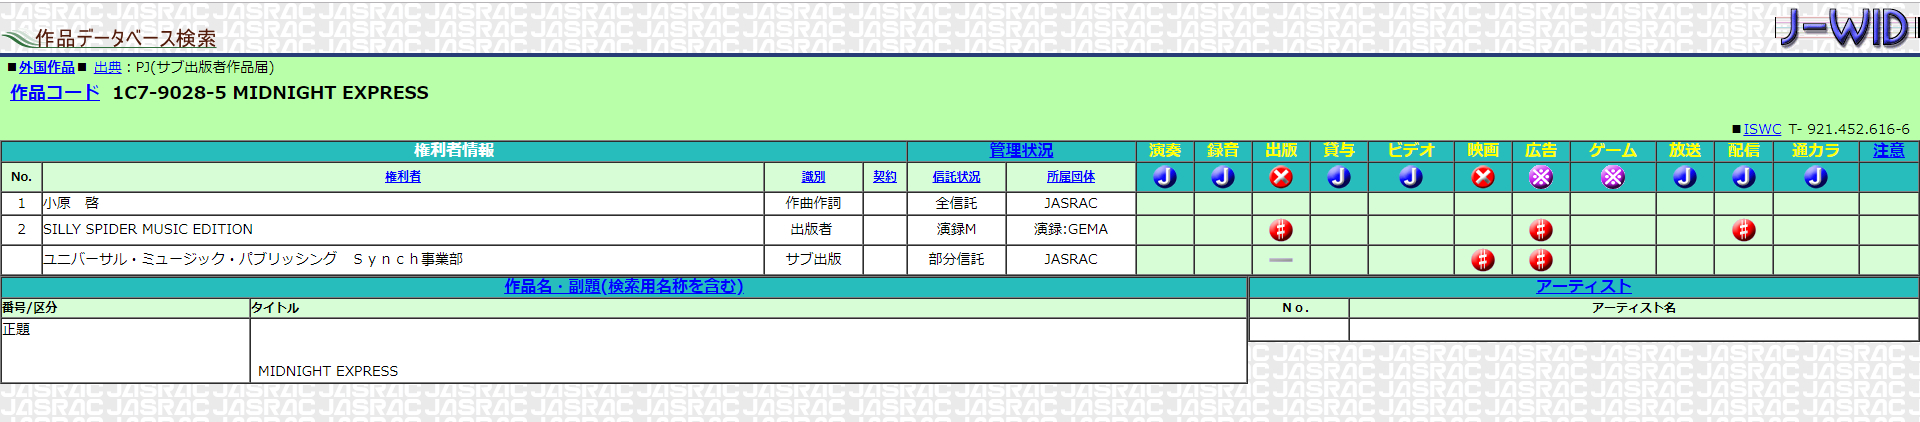 Yuni_20181212104041e3b.jpg